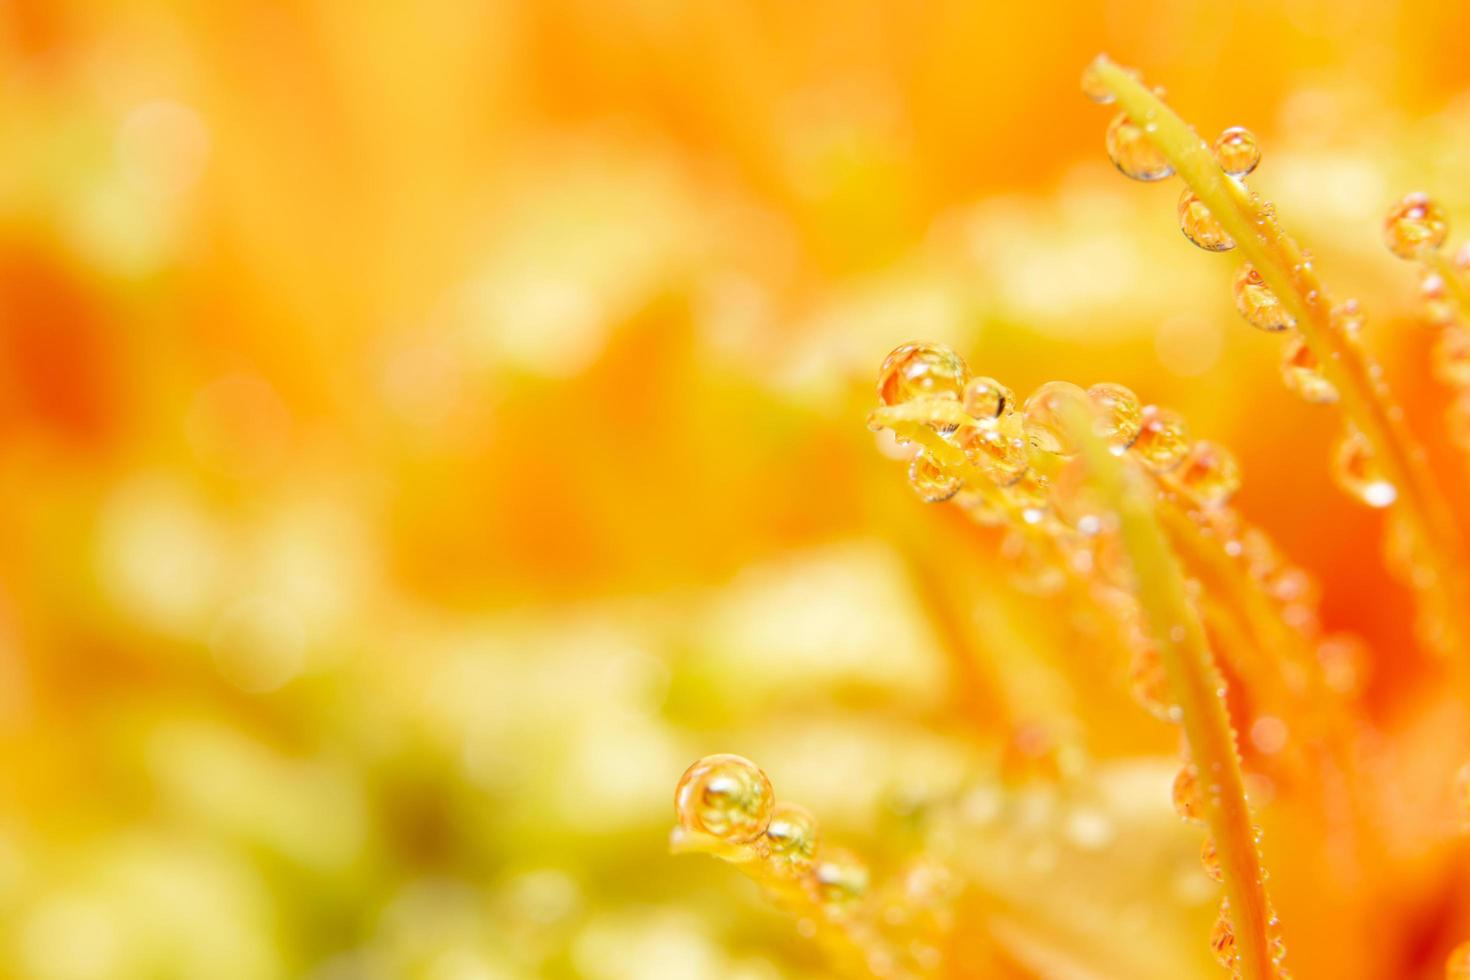 gocce d'acqua su petali di fiori d'arancio, close-up foto